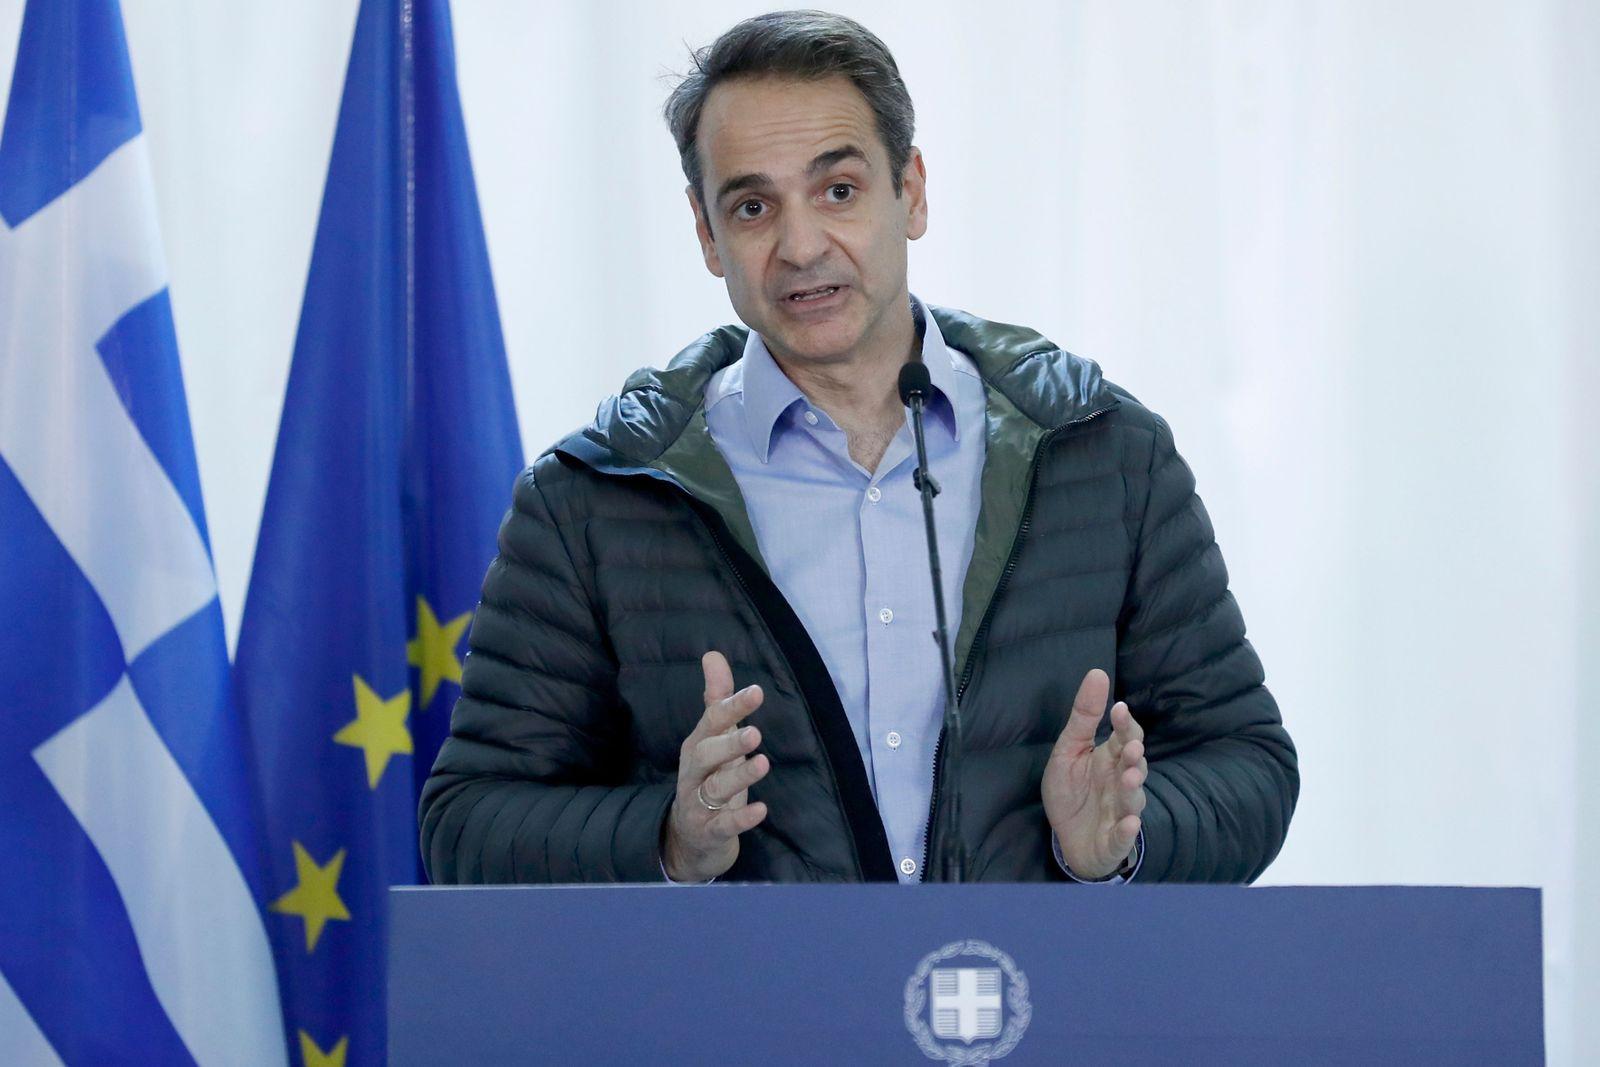 EU officials visit Greek-Turkish border to asses migrant situation, Orestiada, Greece - 03 Mar 2020